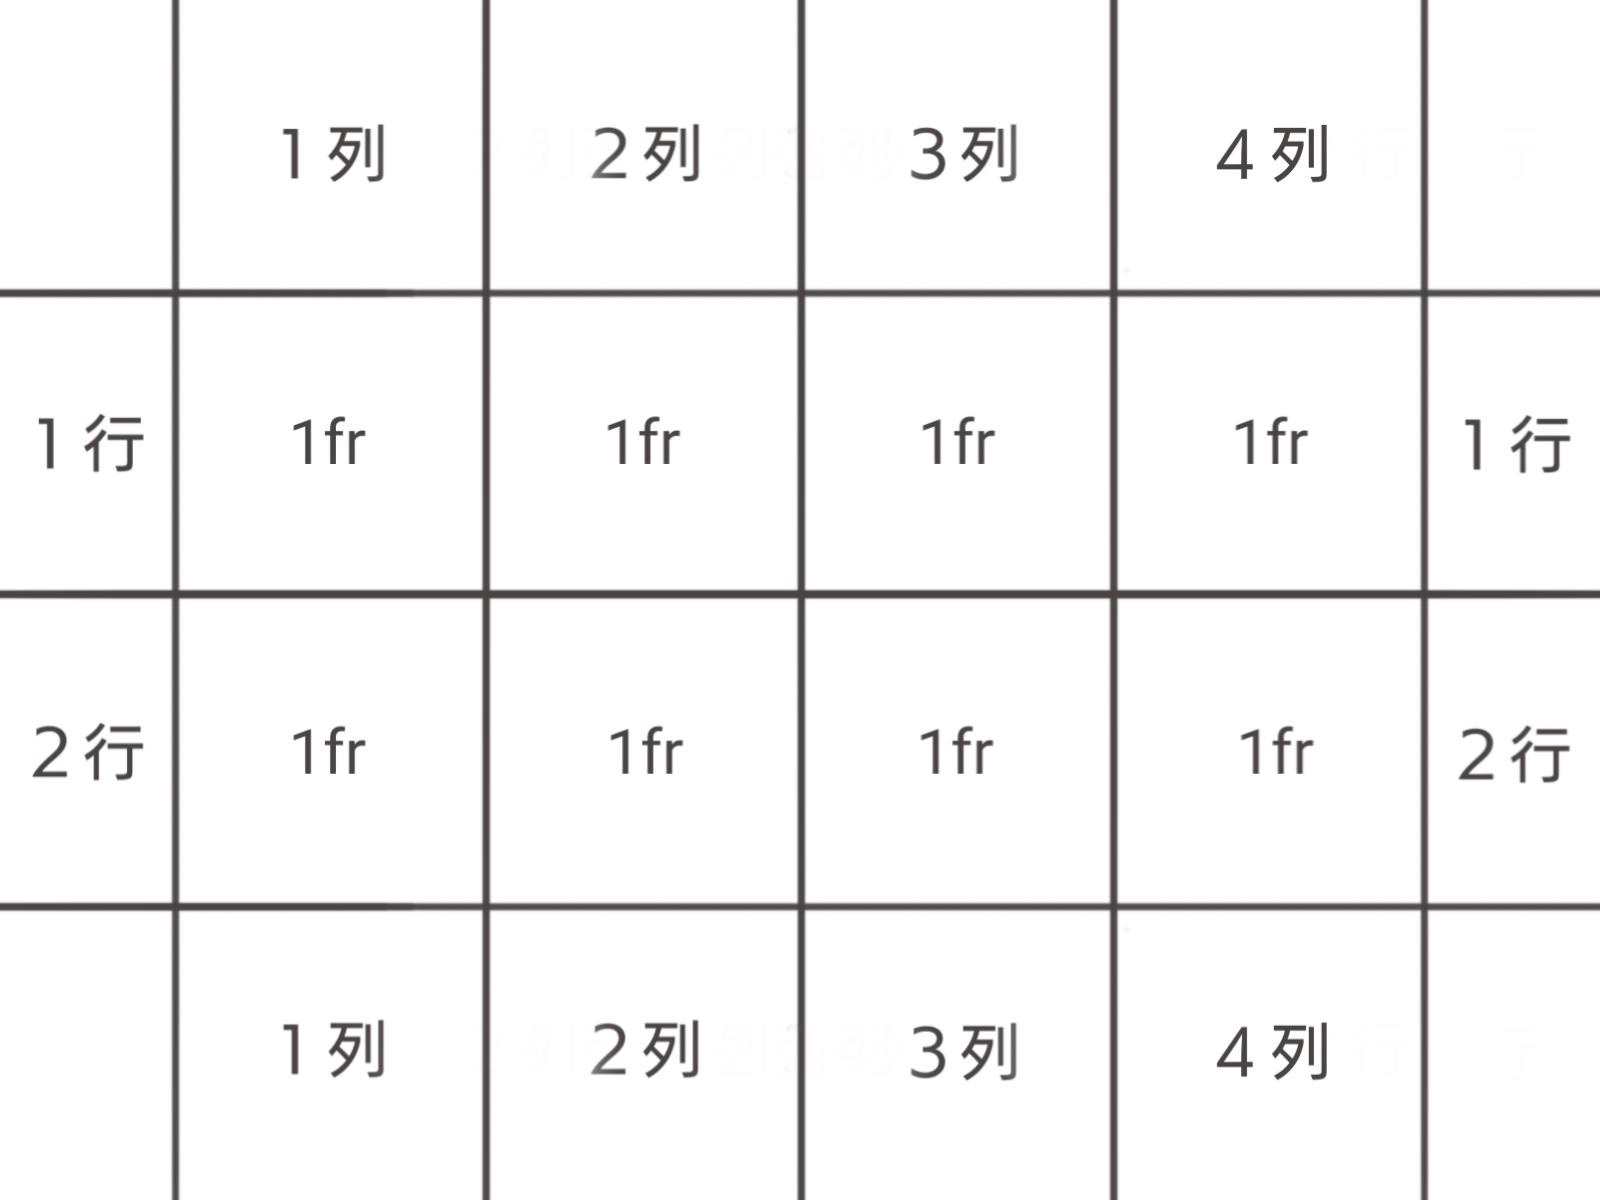 Grid Layoutの四列と二行の格子